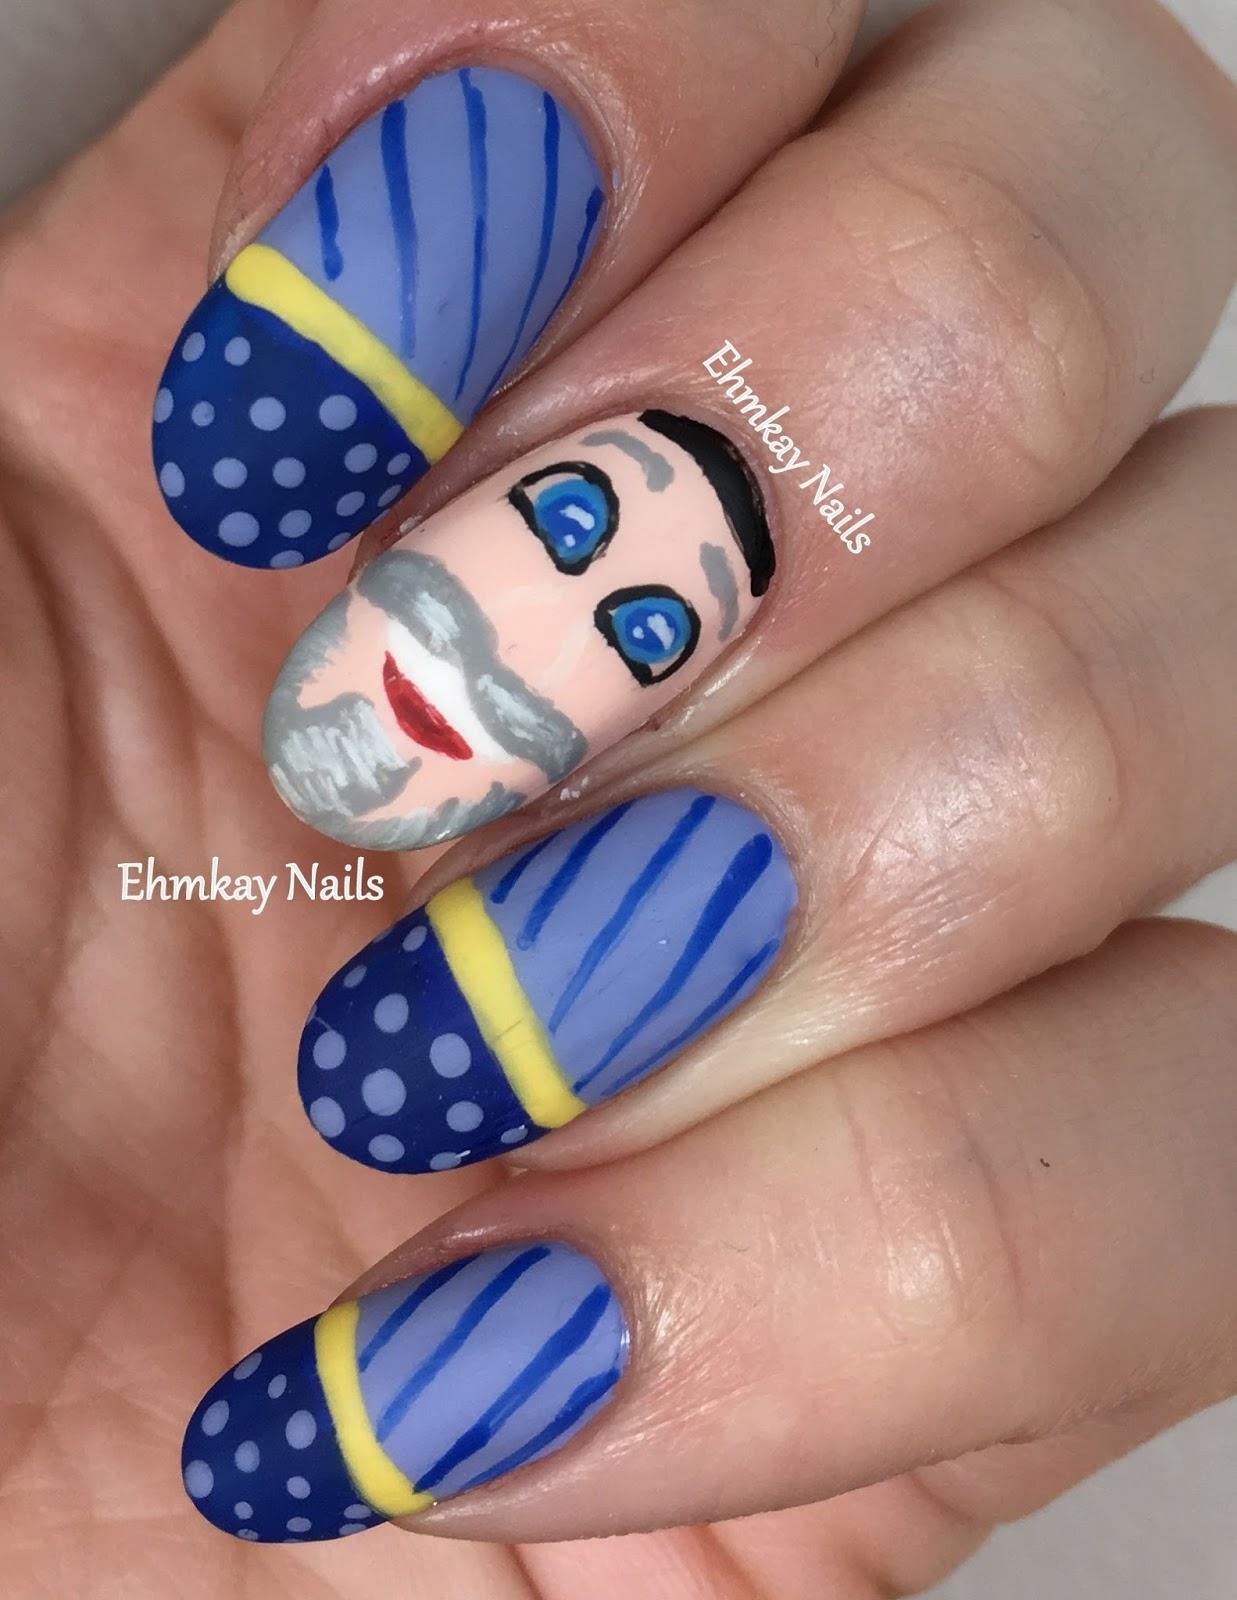 Ehmkay Nails New Year S Eve Nail Art With Kbshimmer Bling: Ehmkay Nails: Mensch On A Bench Nail Art